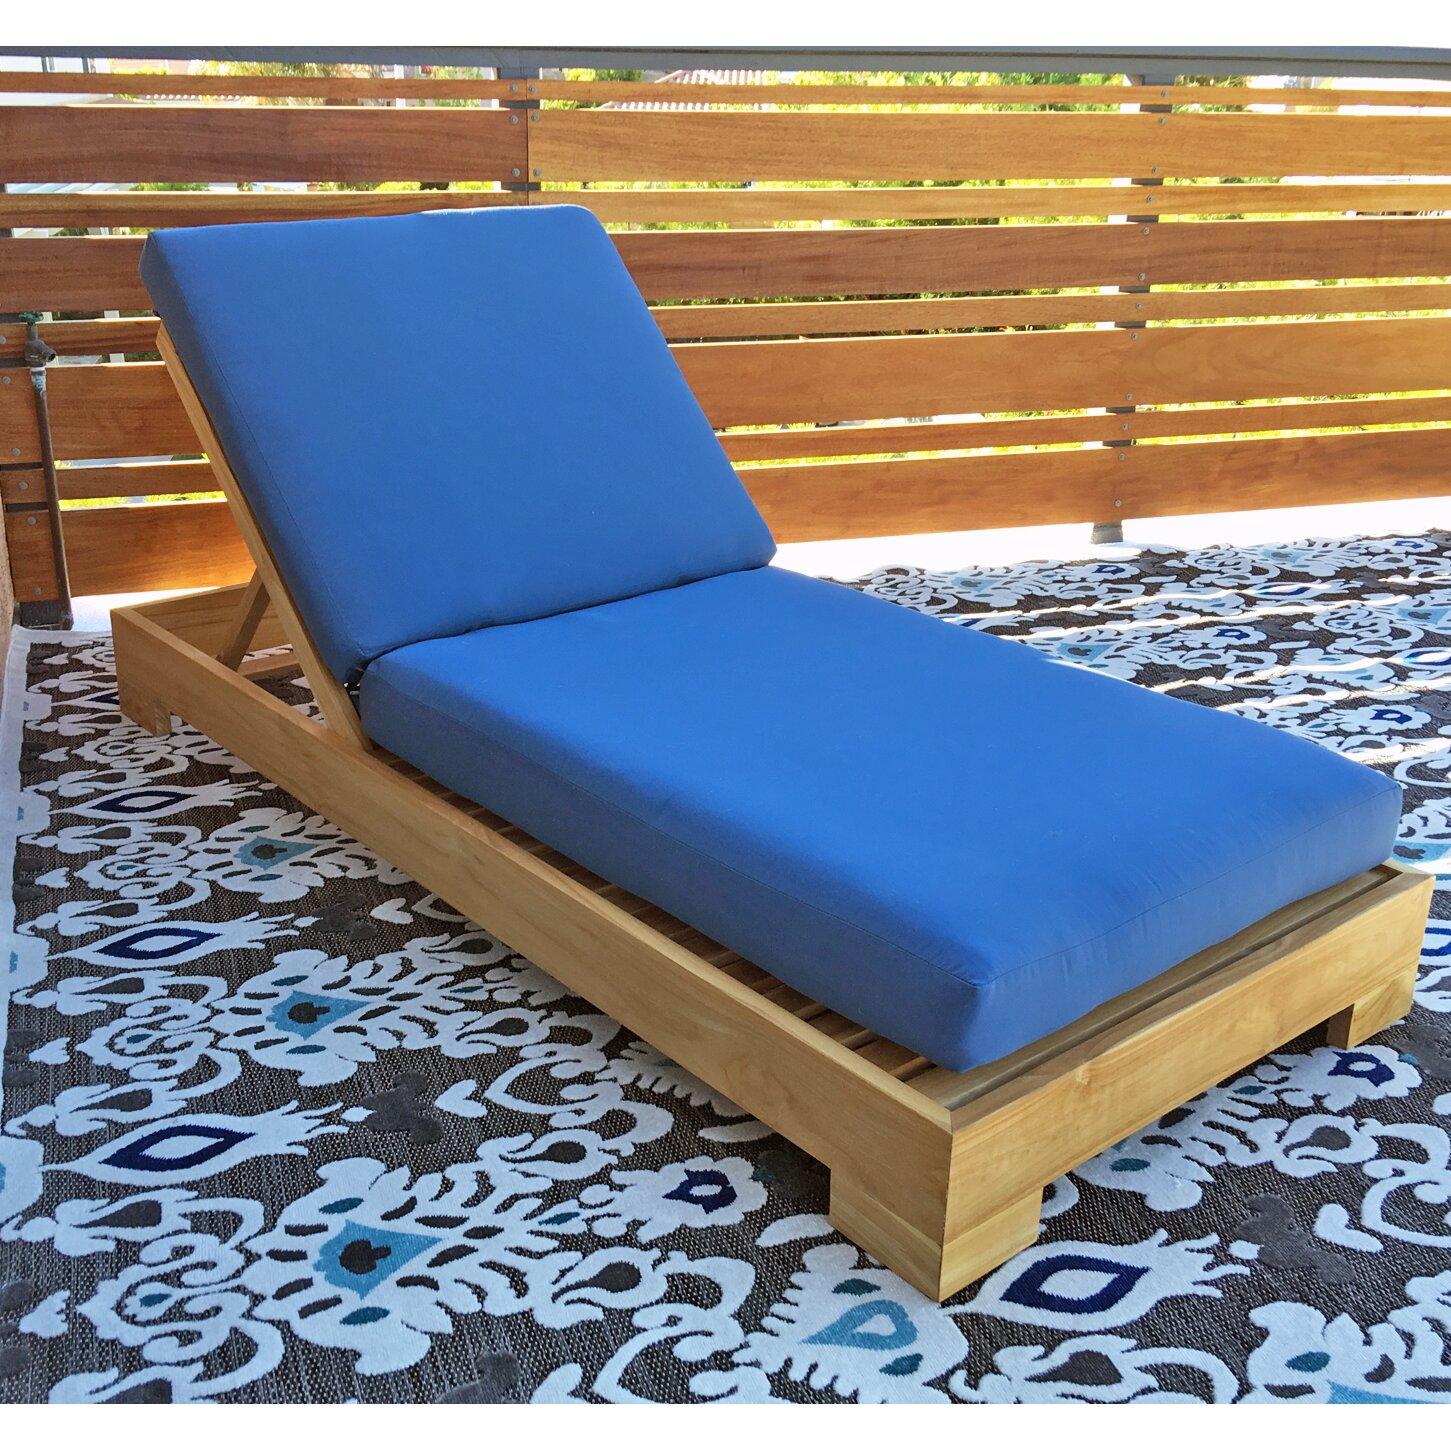 Willow creek designs outdoor sunbrella chaise lounge for Chaise cushions sunbrella